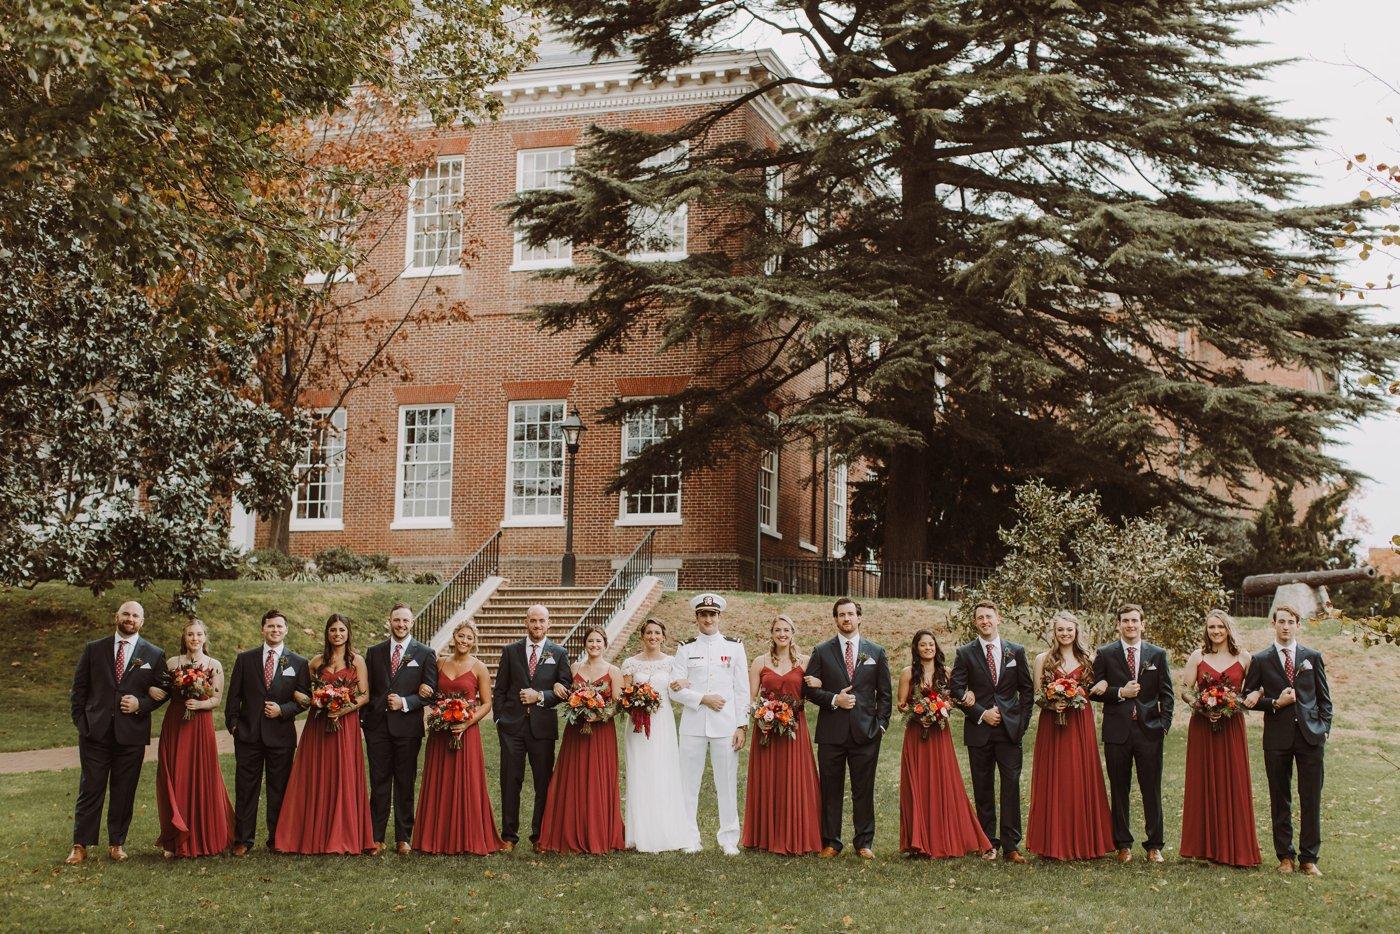 USNA wedding Annapolis Maryland bridal party portraits Annapolis Maryland wedding photographer